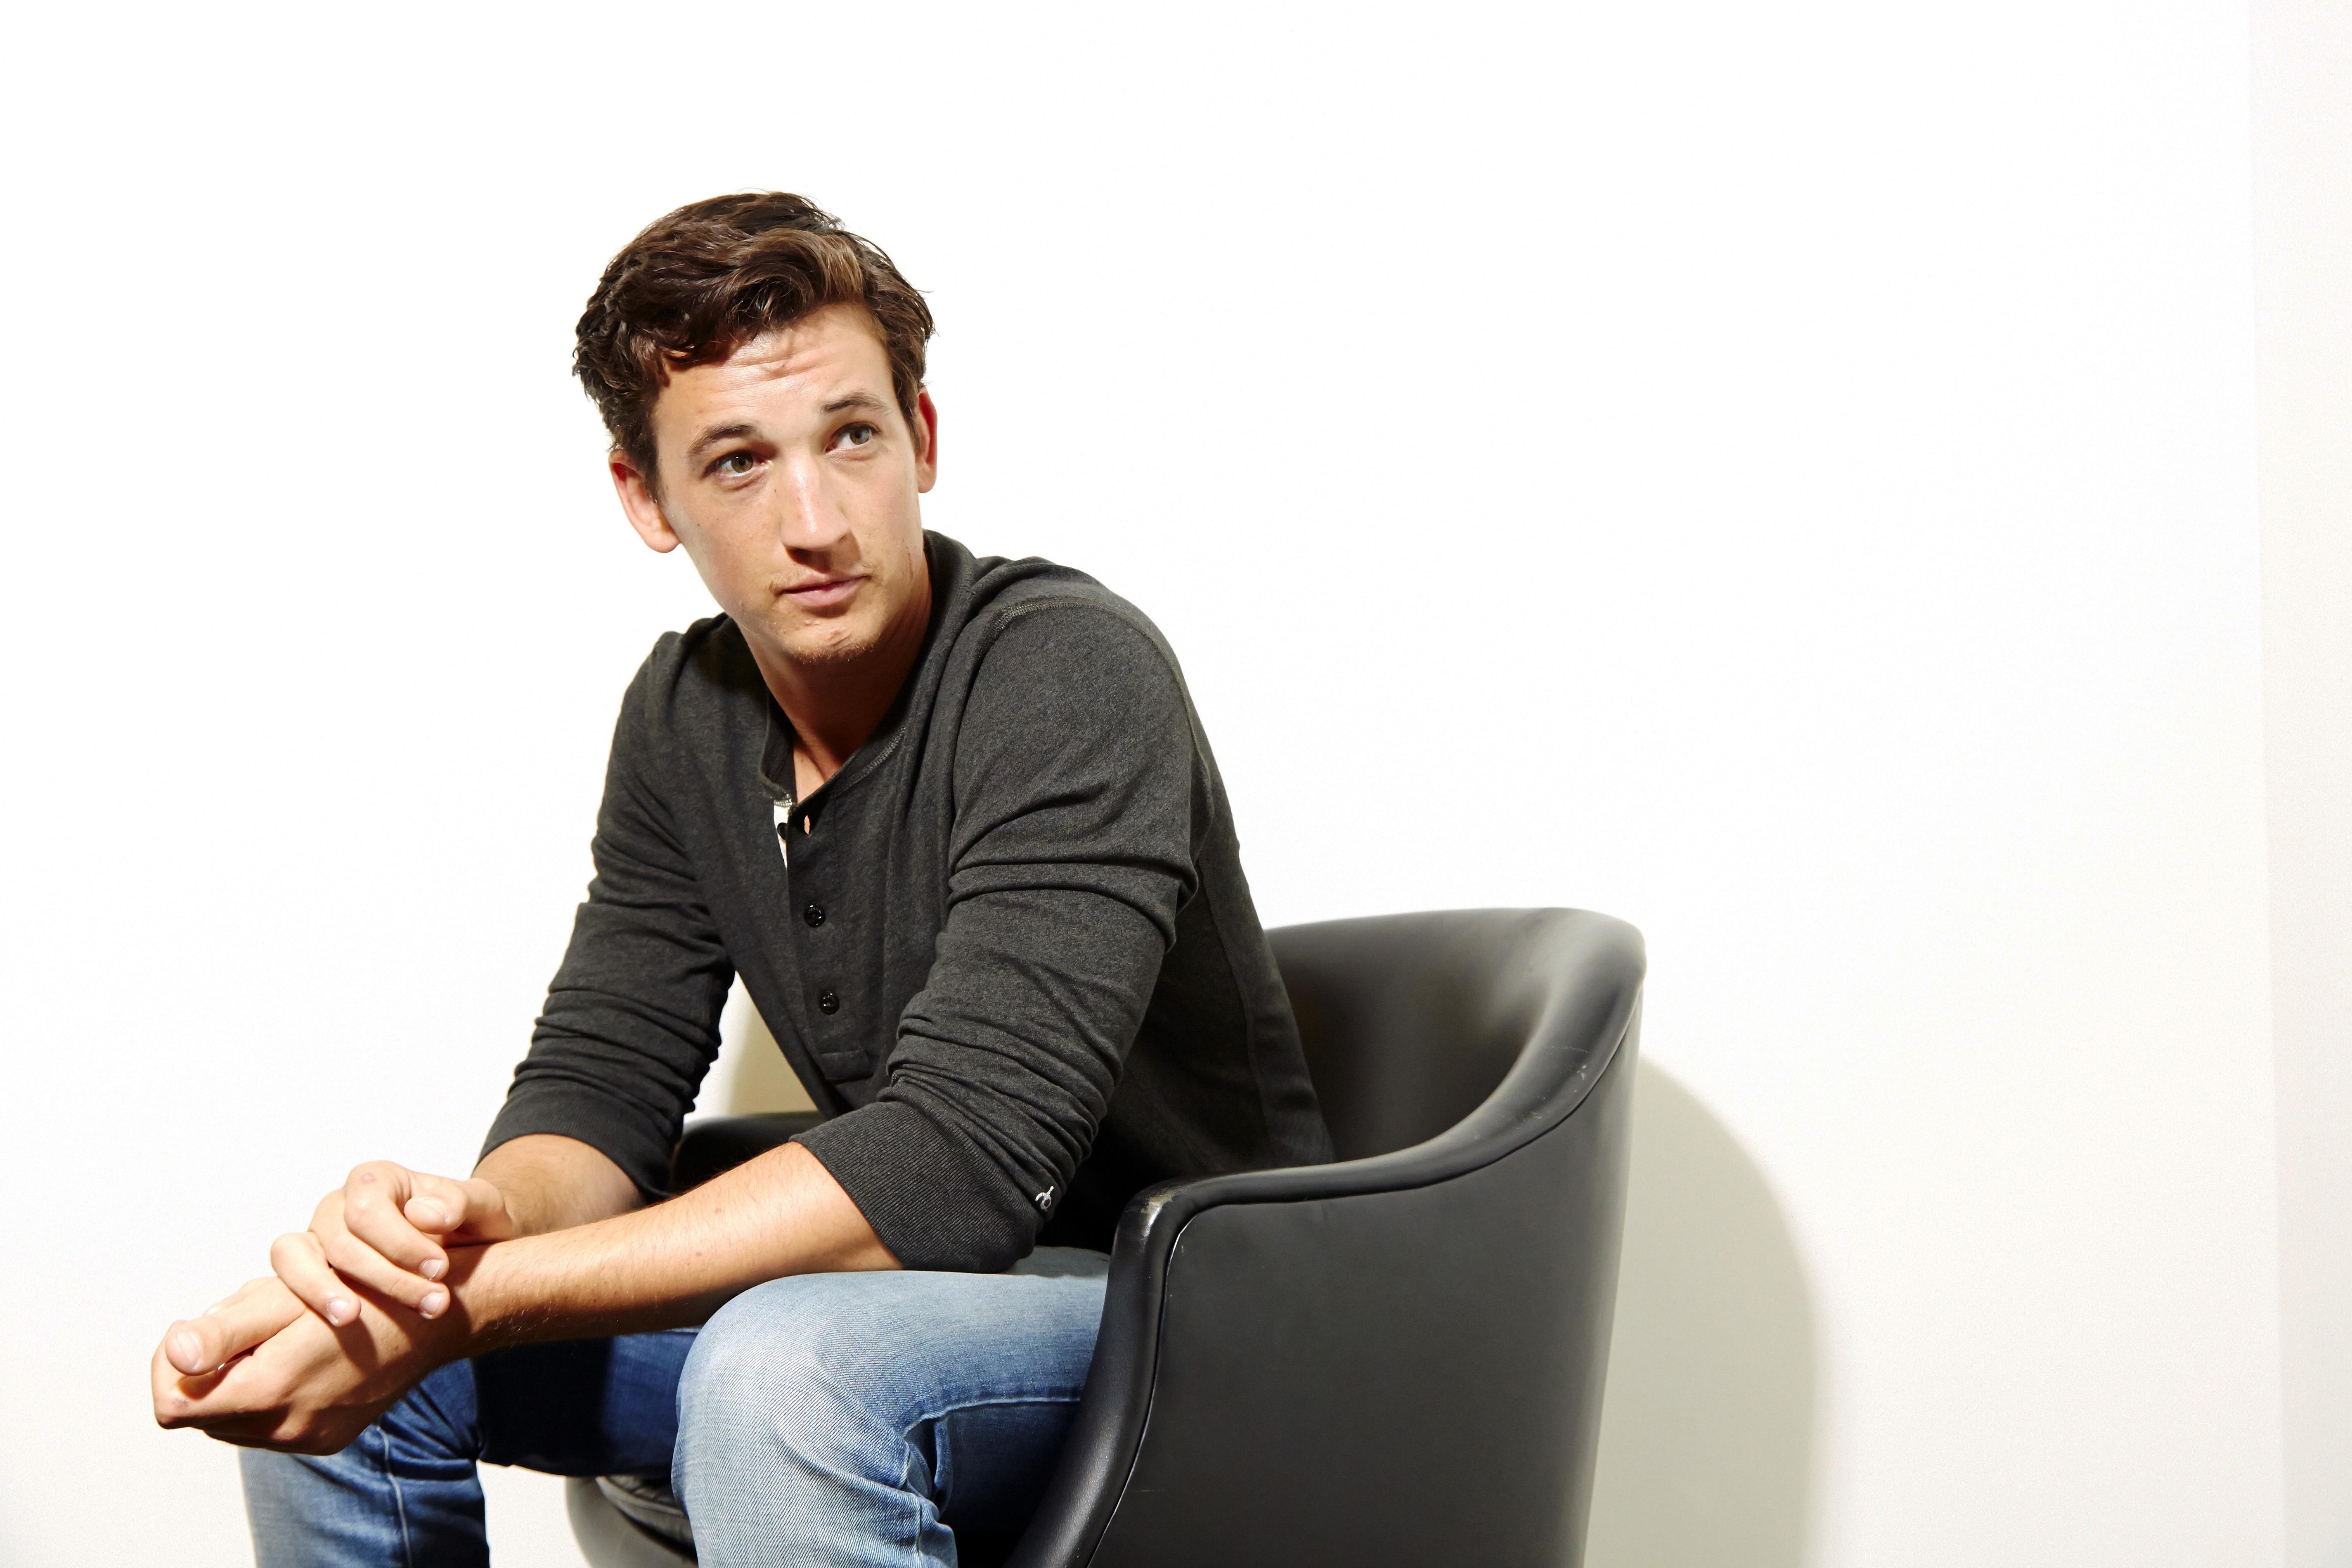 Bafta Rising Star nominee: Who is Miles Teller?